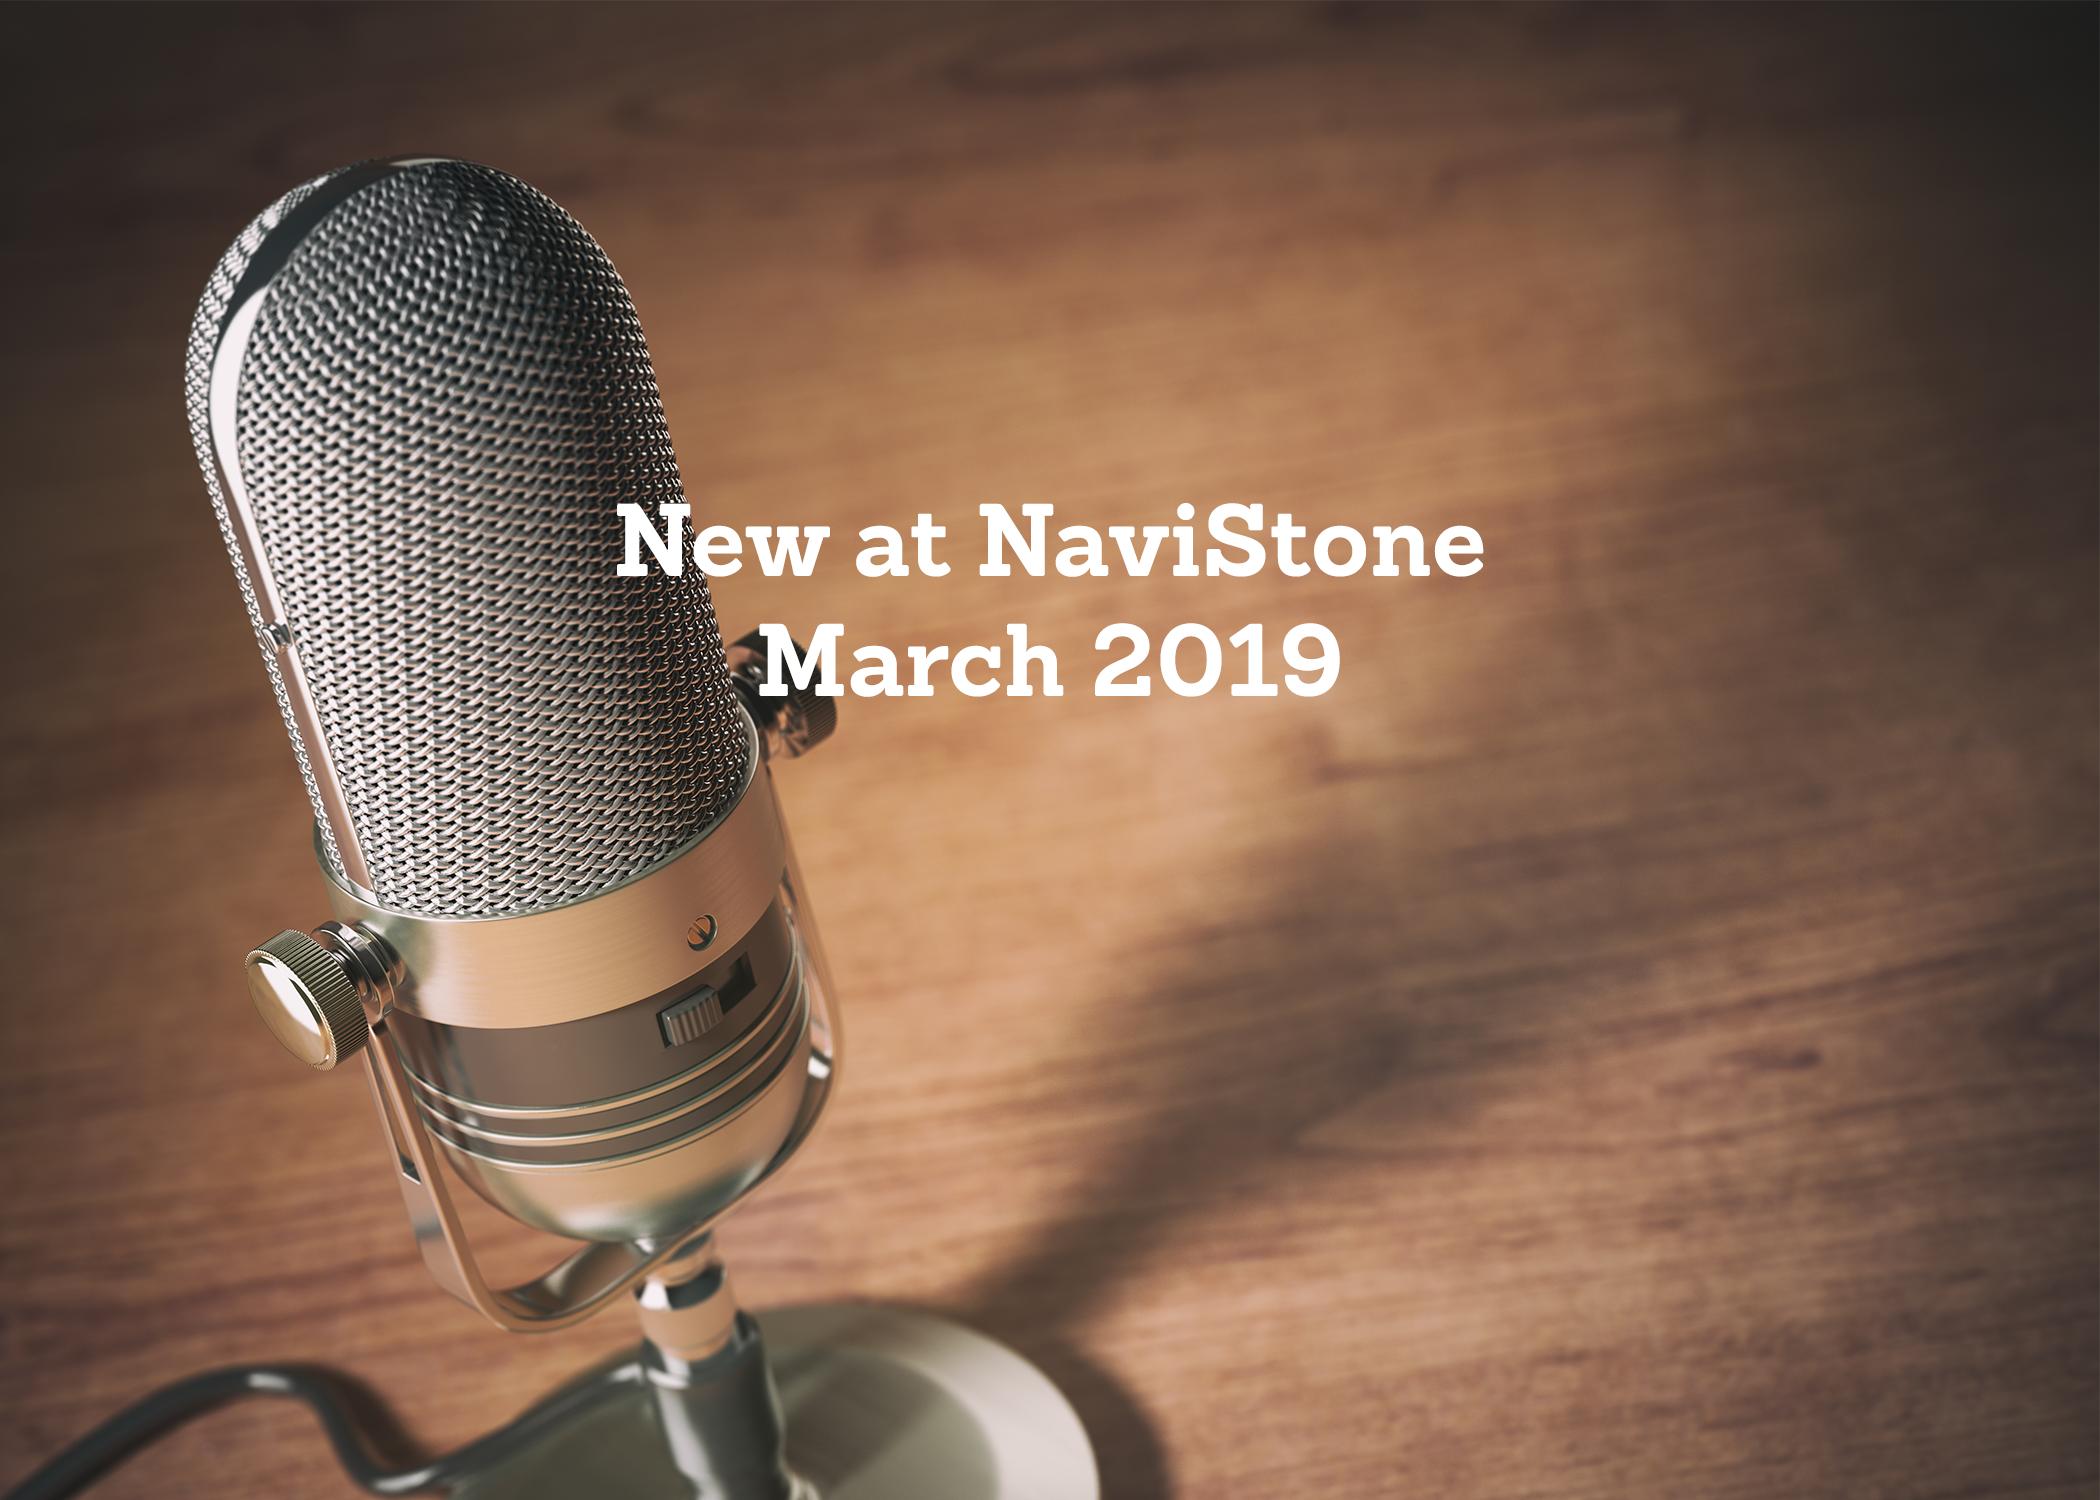 New at NaviStone March 2019